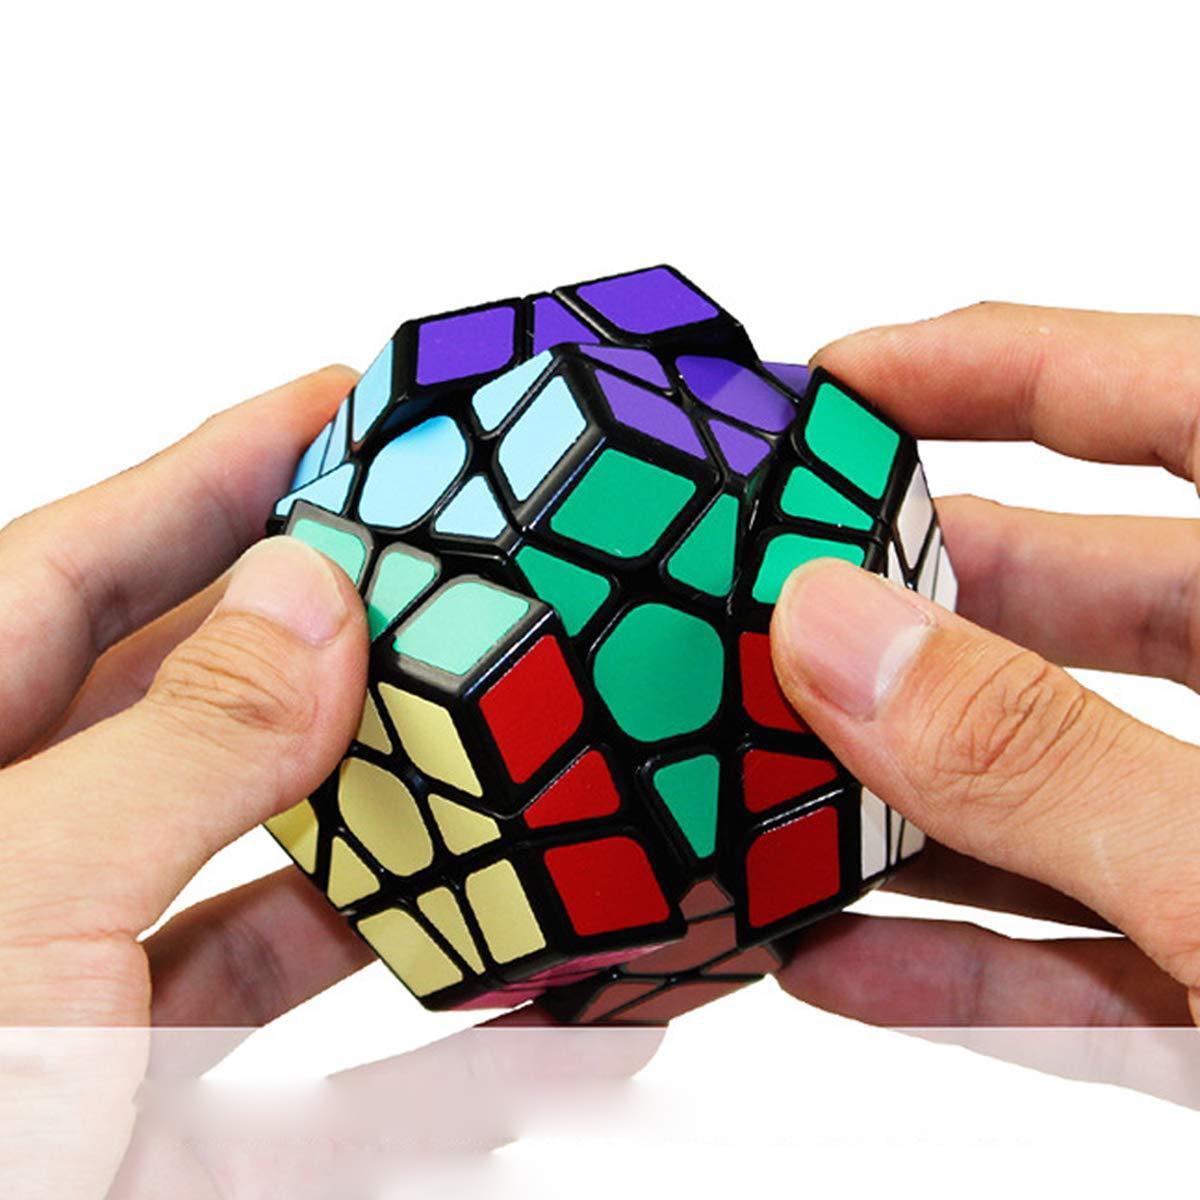 5 St/ück Speed Cube Set 2x2 3x3 Pyraminx Megaminx Mirror SpeedCube 3D Puzzle Magic Cubes f/ür Kinder Erwachsene Anf/änger Coolzon Zauberw/ürfel Set